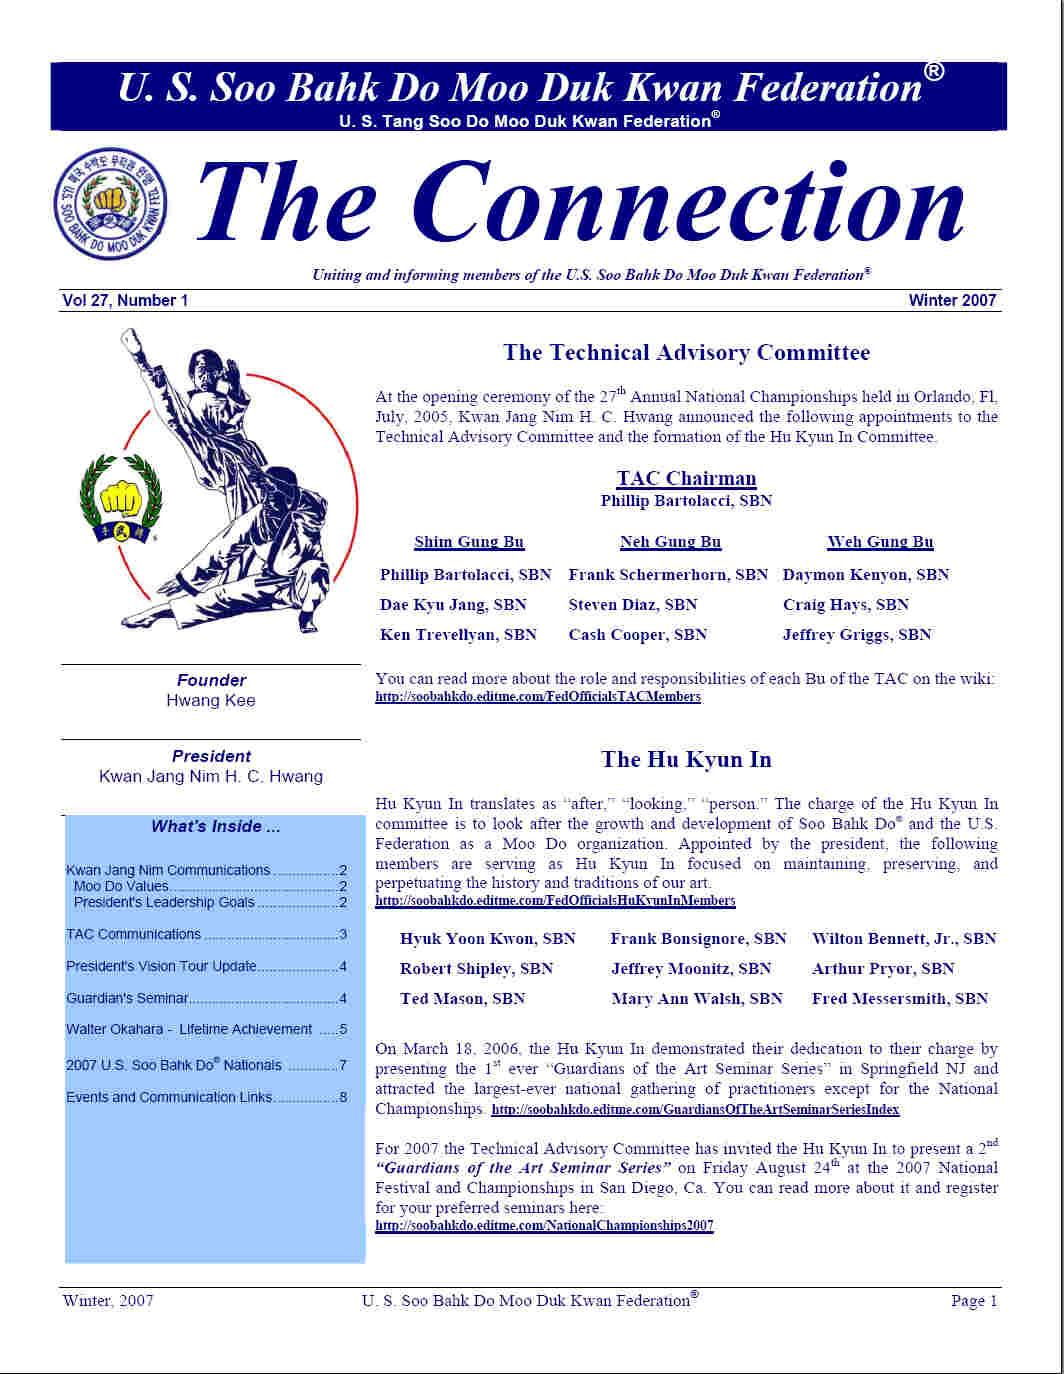 2007 Winter Edition